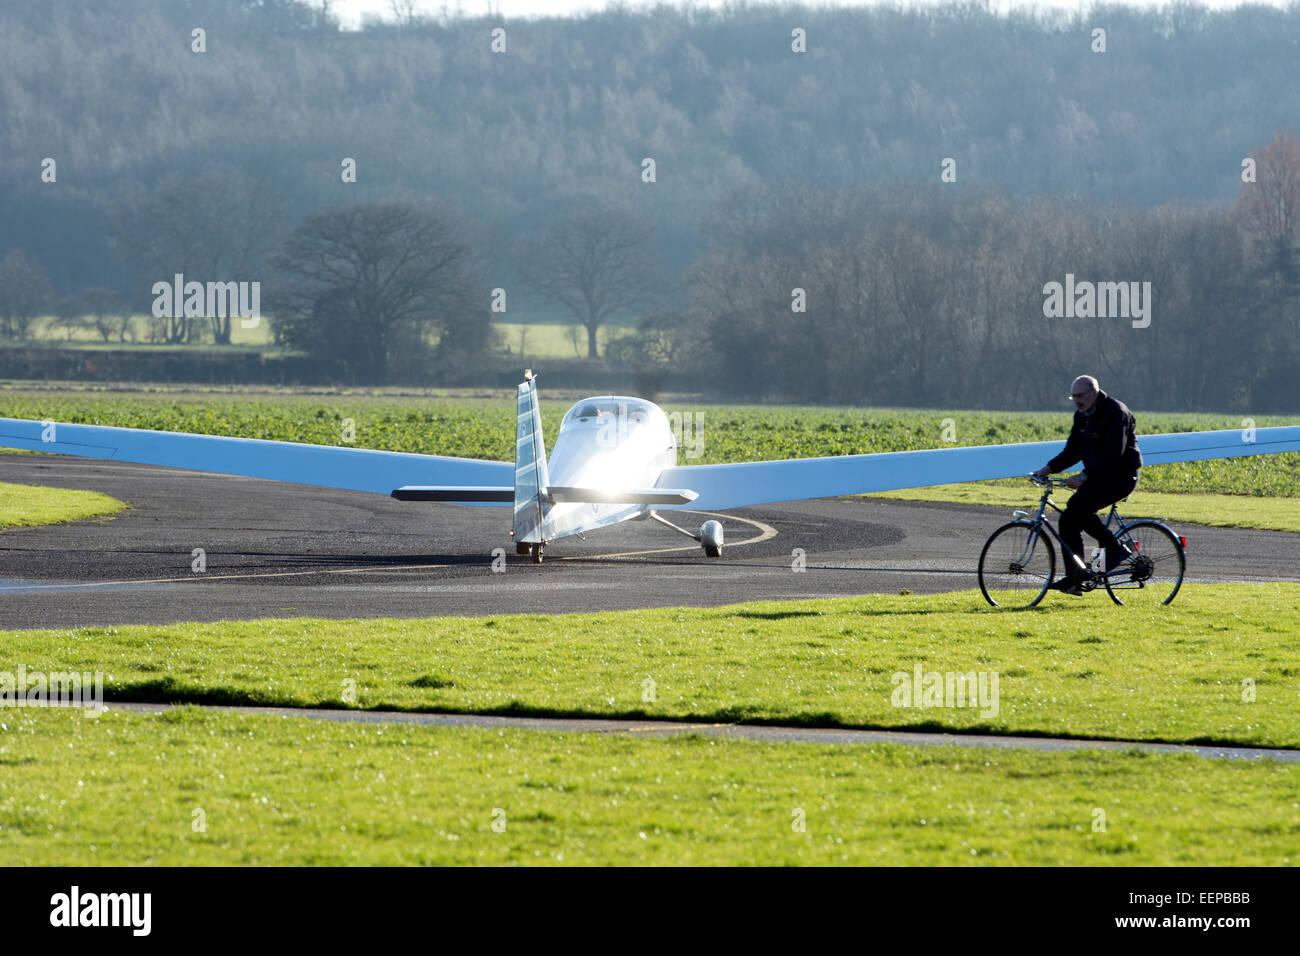 Scheibe SF-25 Motorfalke (G-KIAU) taxiing at Wellesbourne Airfield - Stock Image